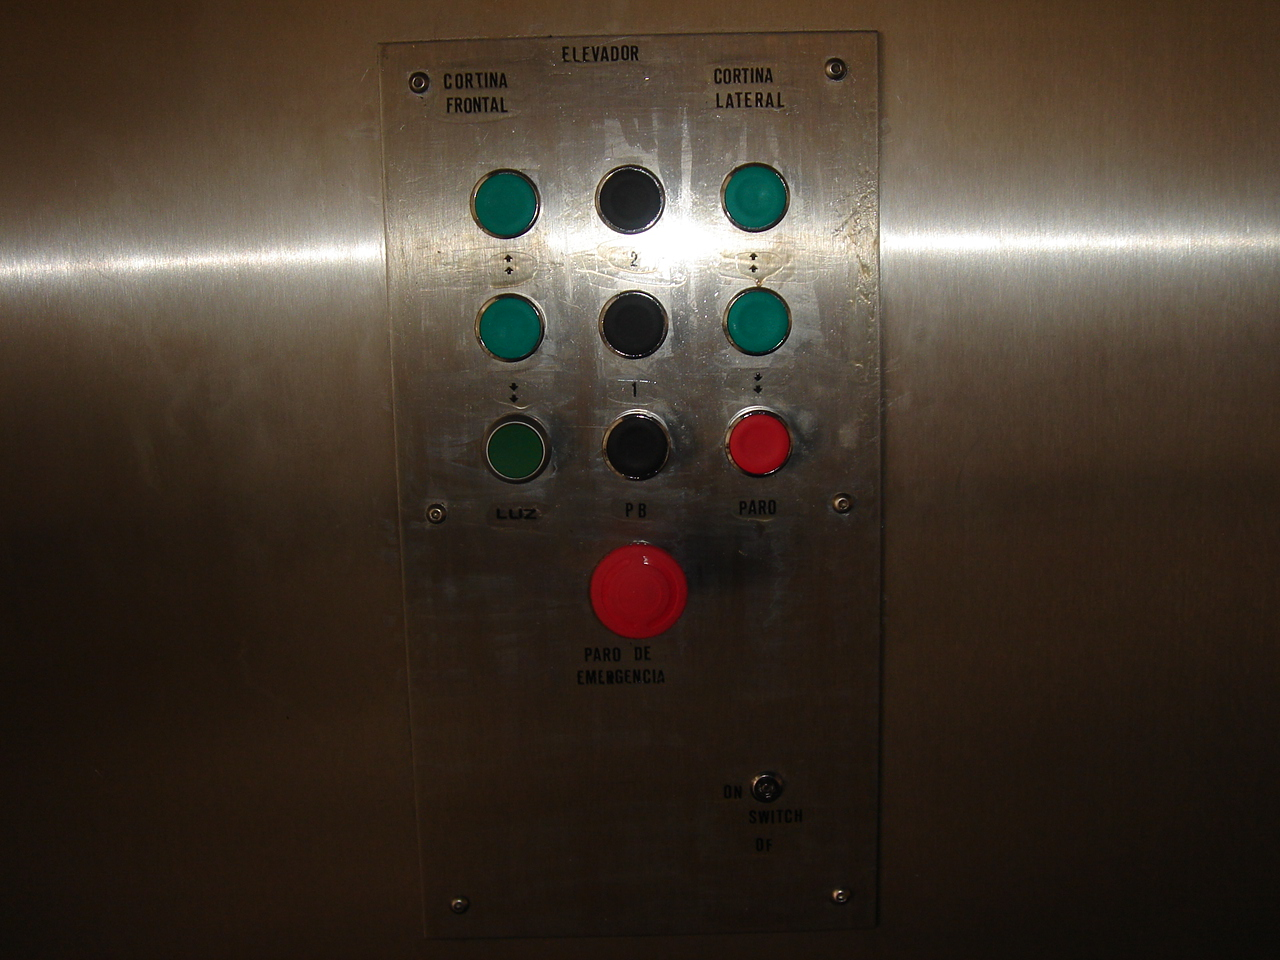 Elevador carga detalle